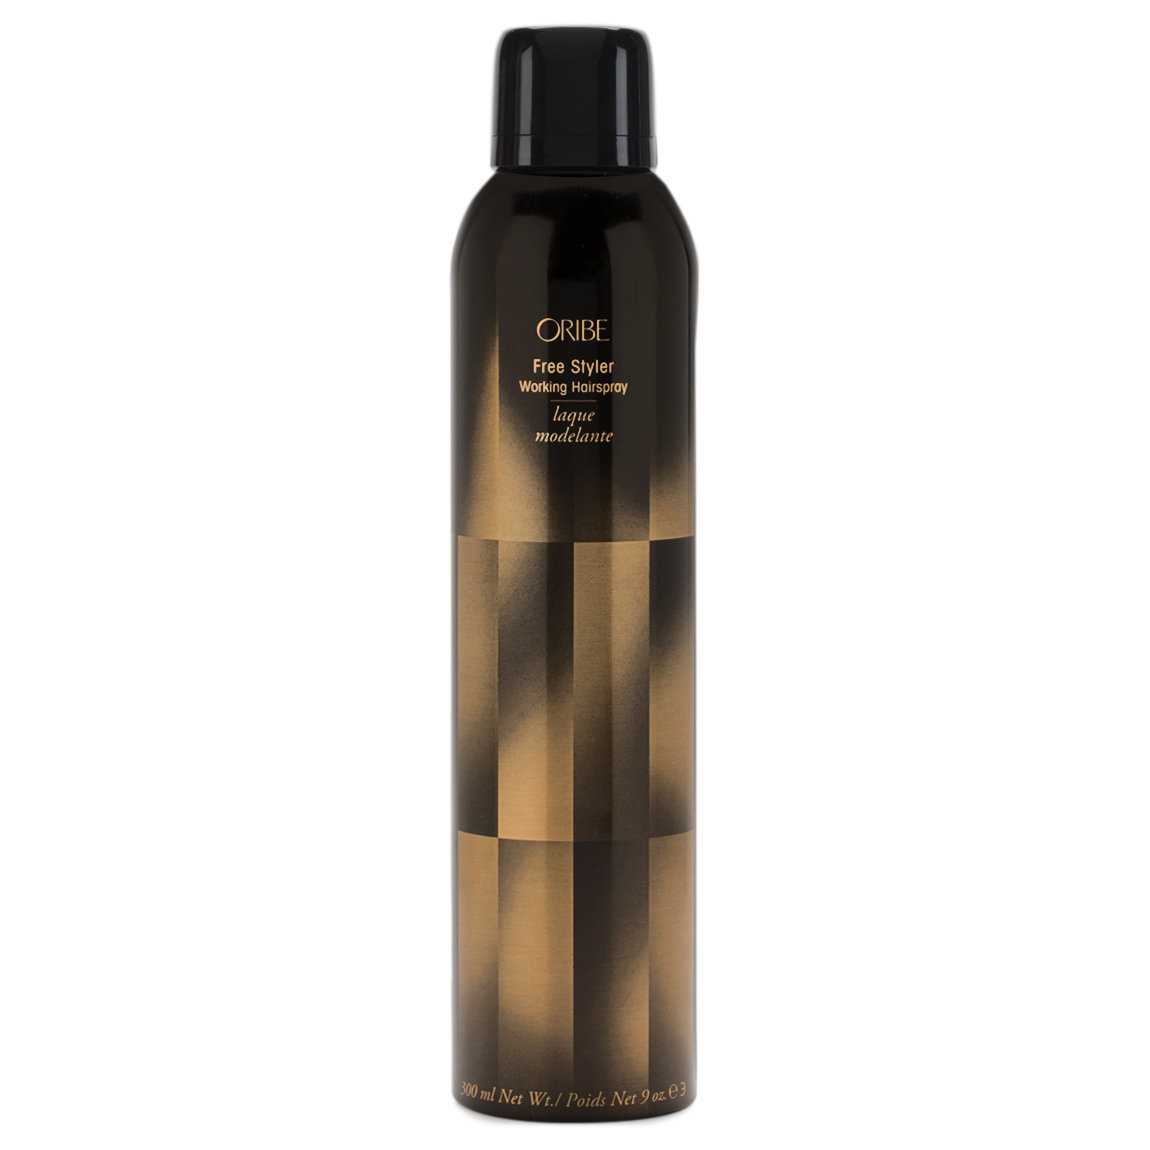 Oribe Free Styler Working Hairspray 9 oz product swatch.